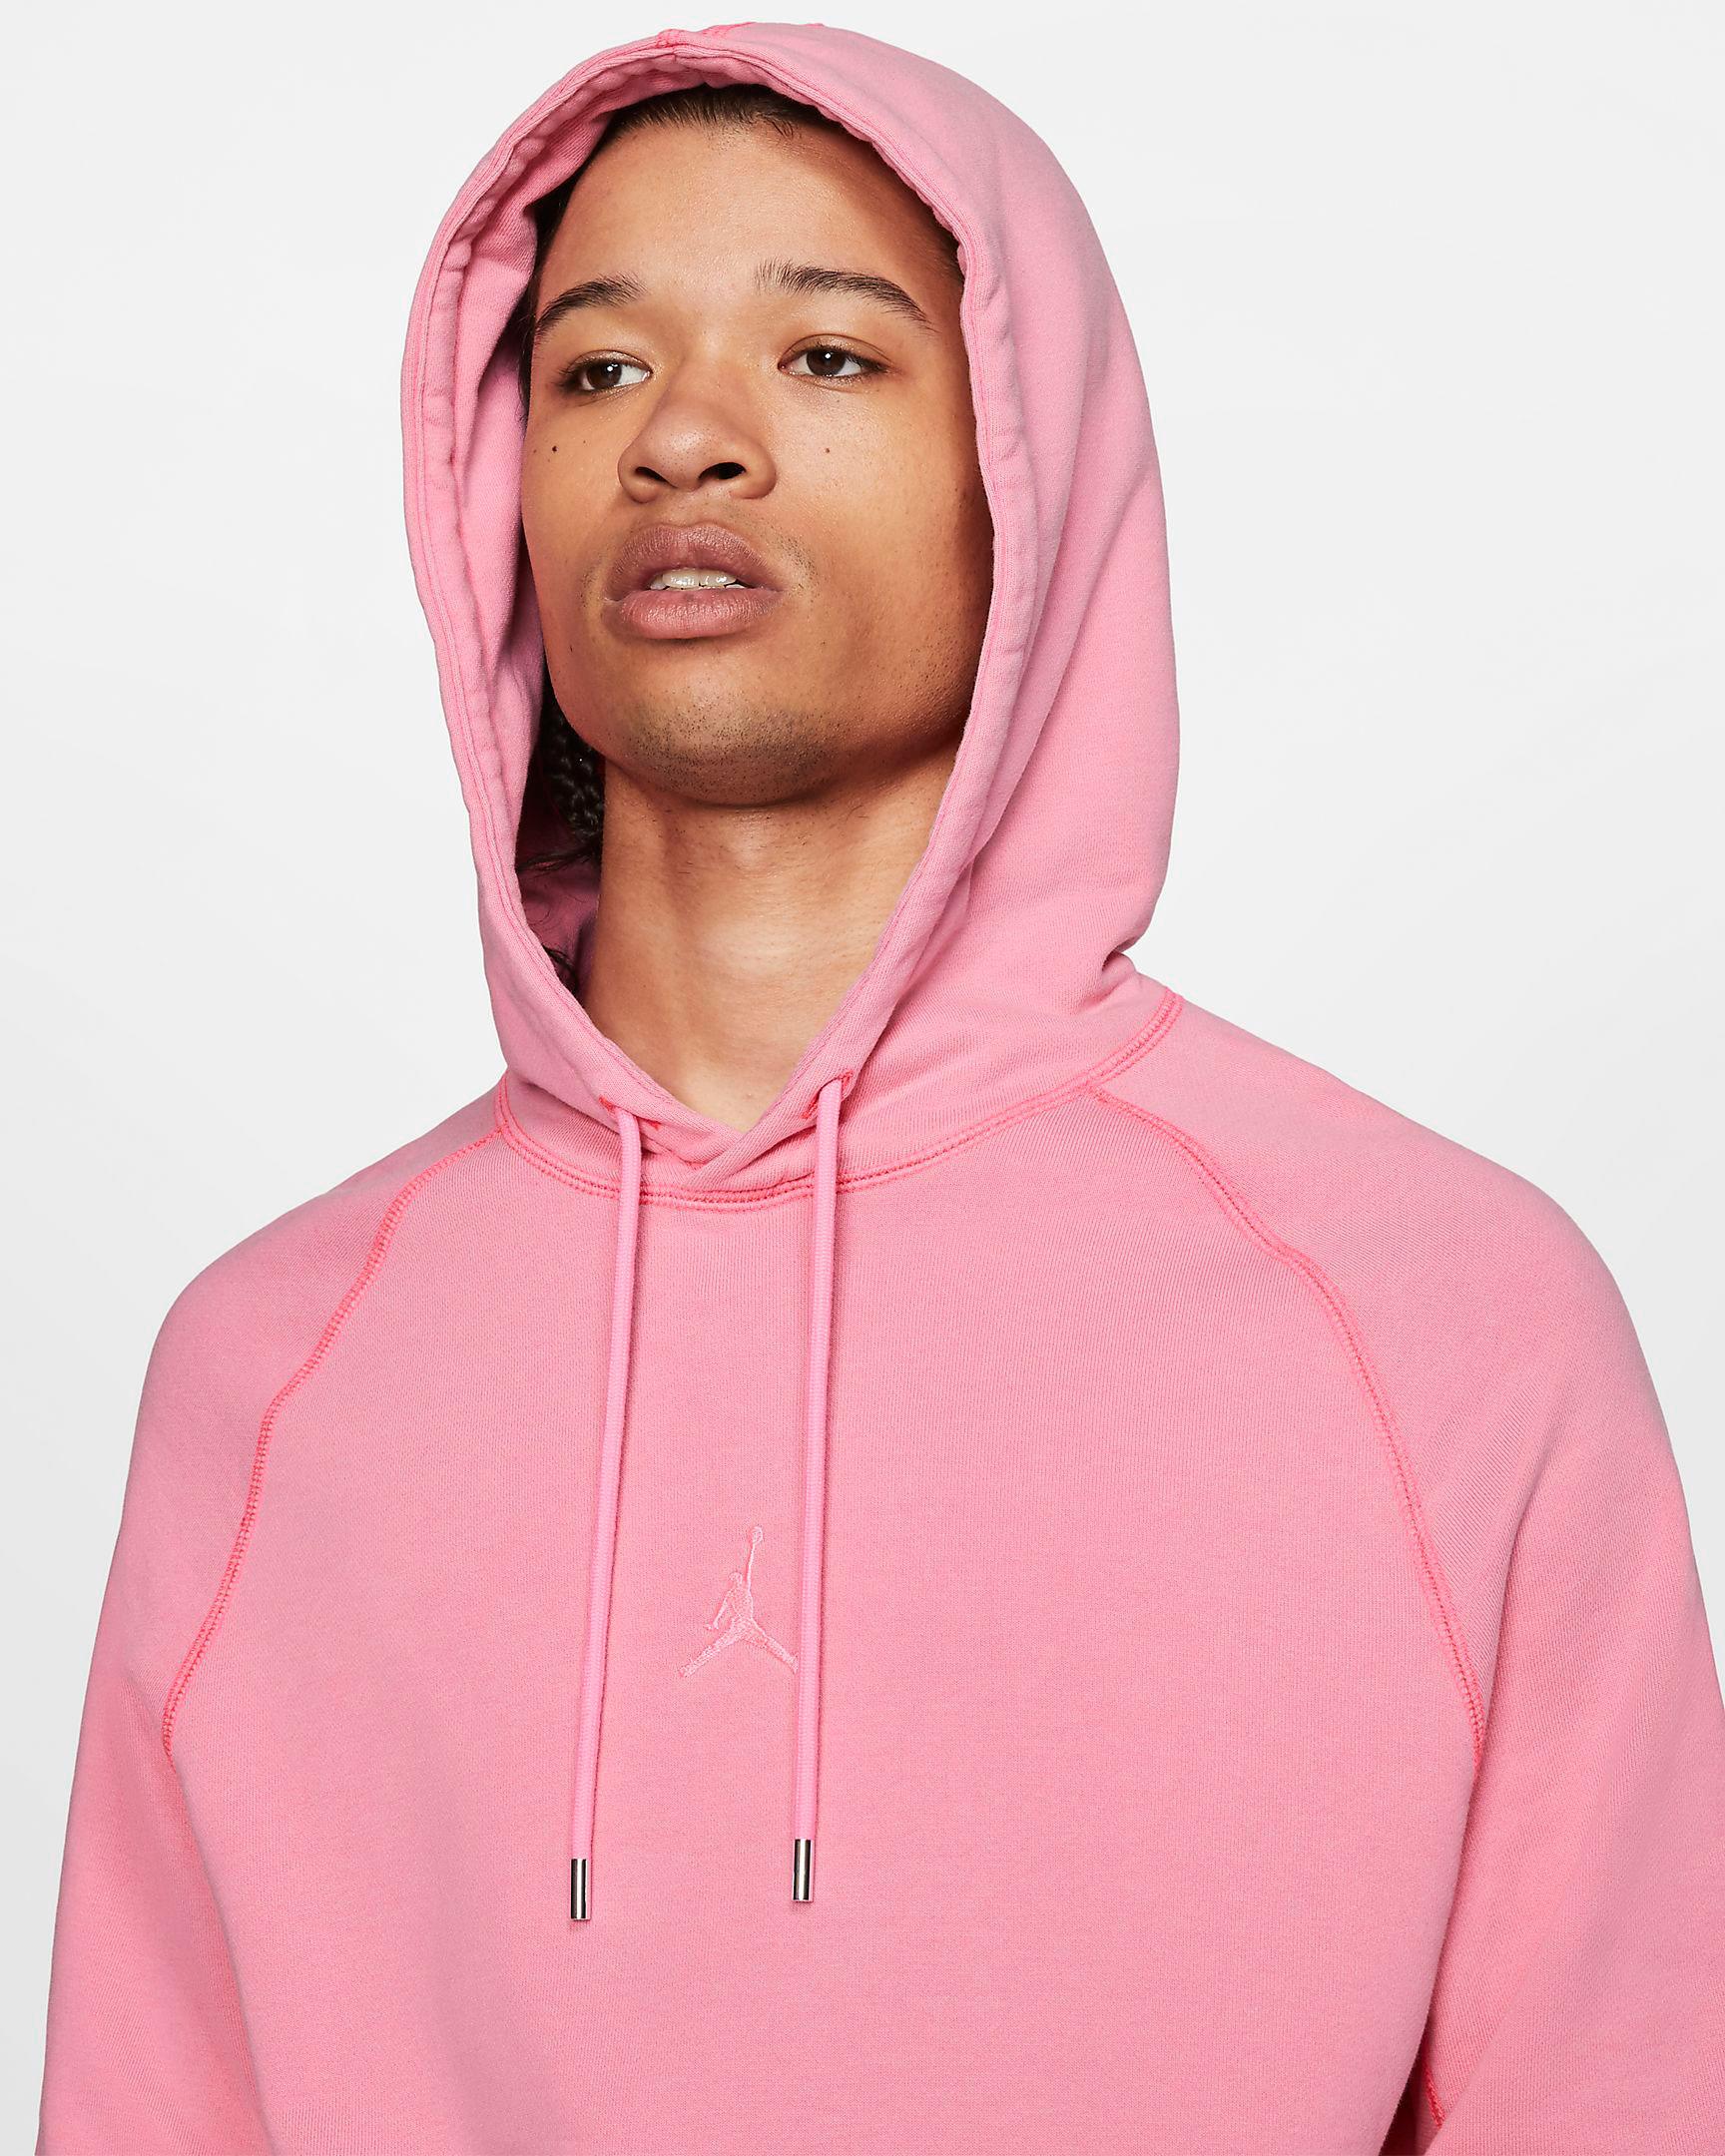 jordan-13-chinese-new-year-pink-hoodie